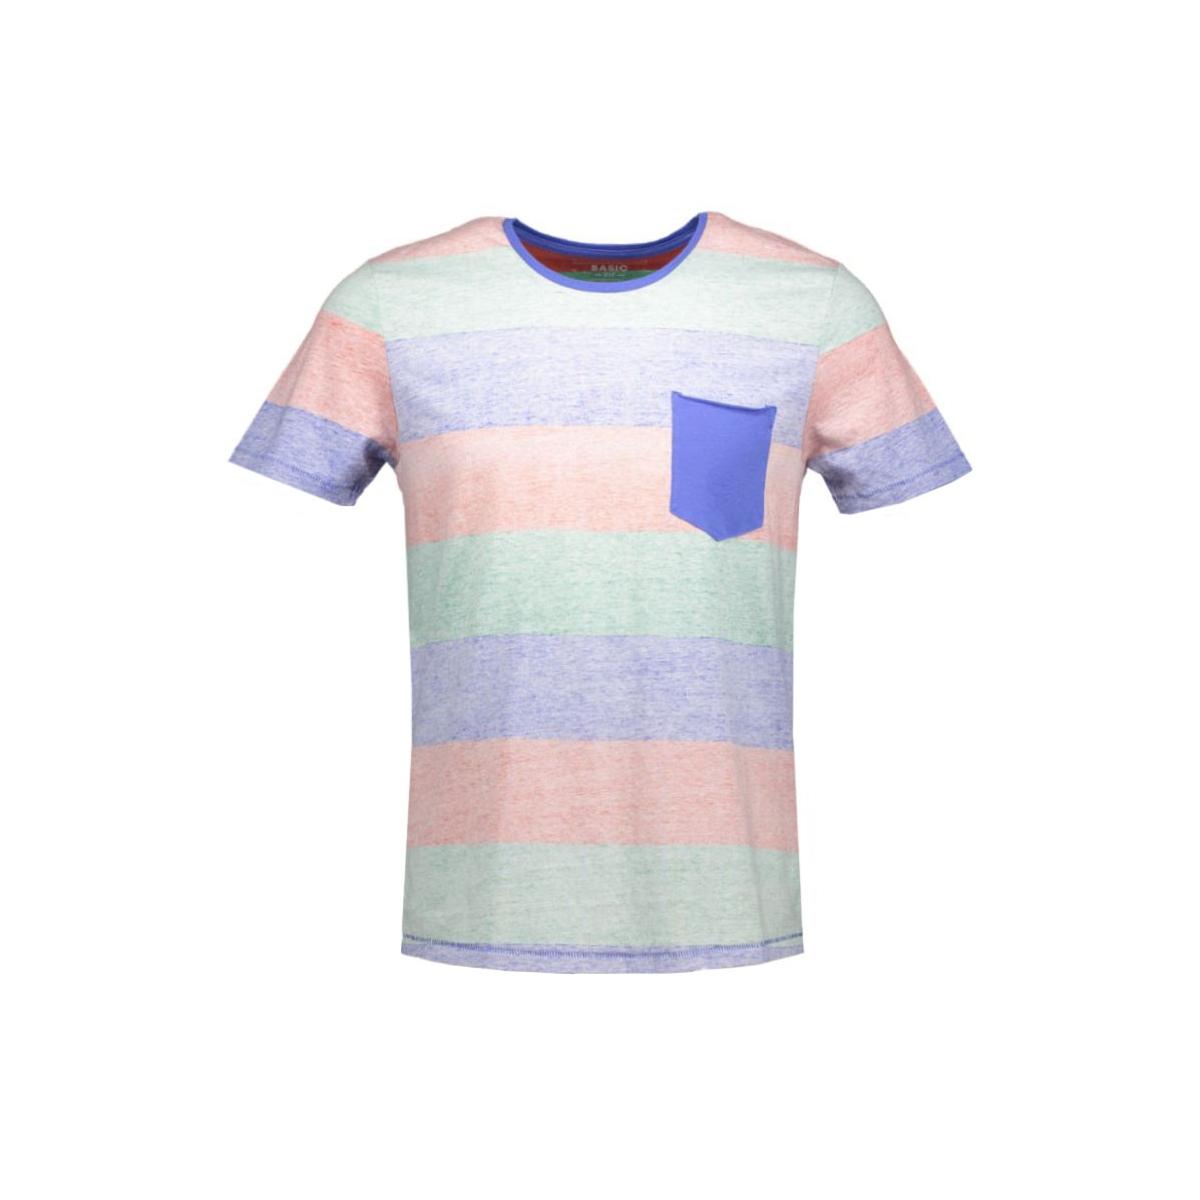 1033291.09.12 tom tailor t-shirt 6682